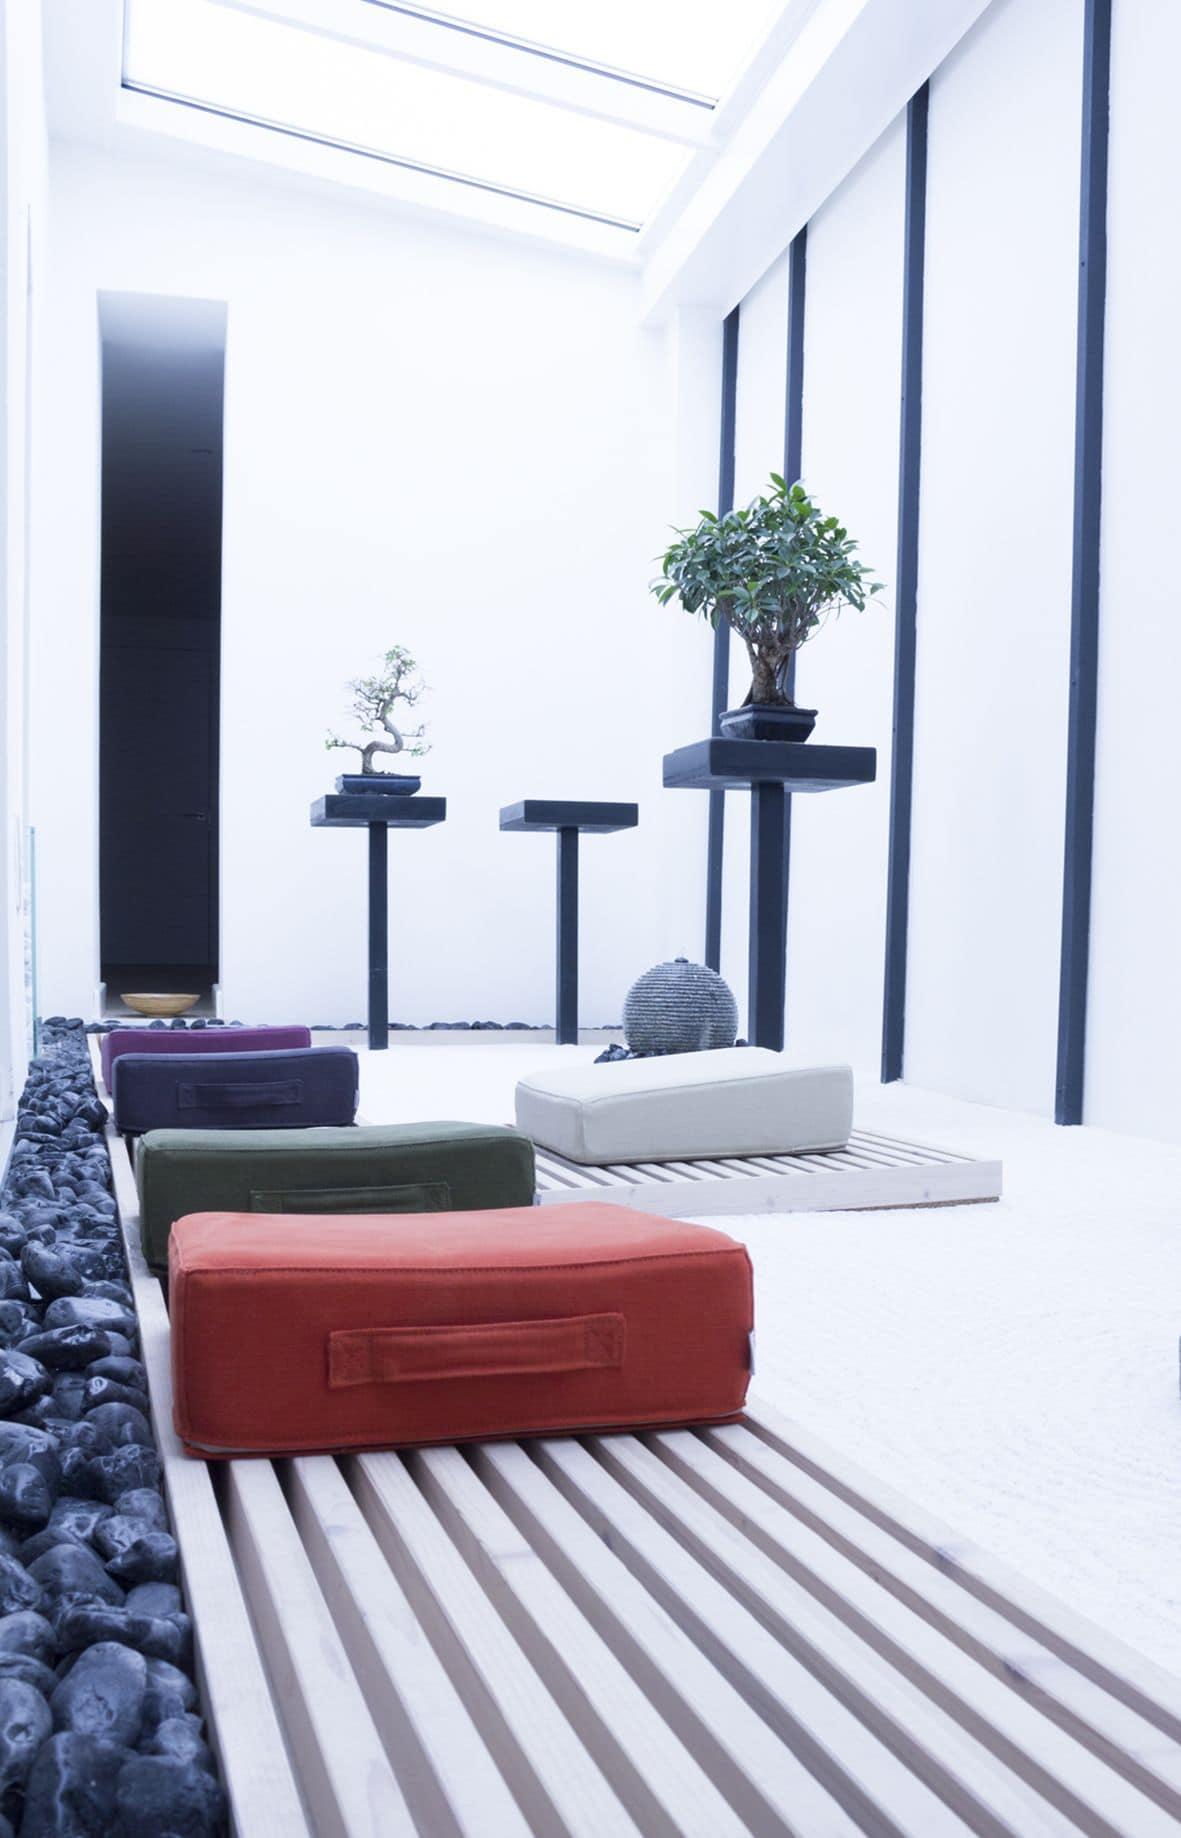 meditationskissen f r zuhause und fitness studio idfdesign. Black Bedroom Furniture Sets. Home Design Ideas